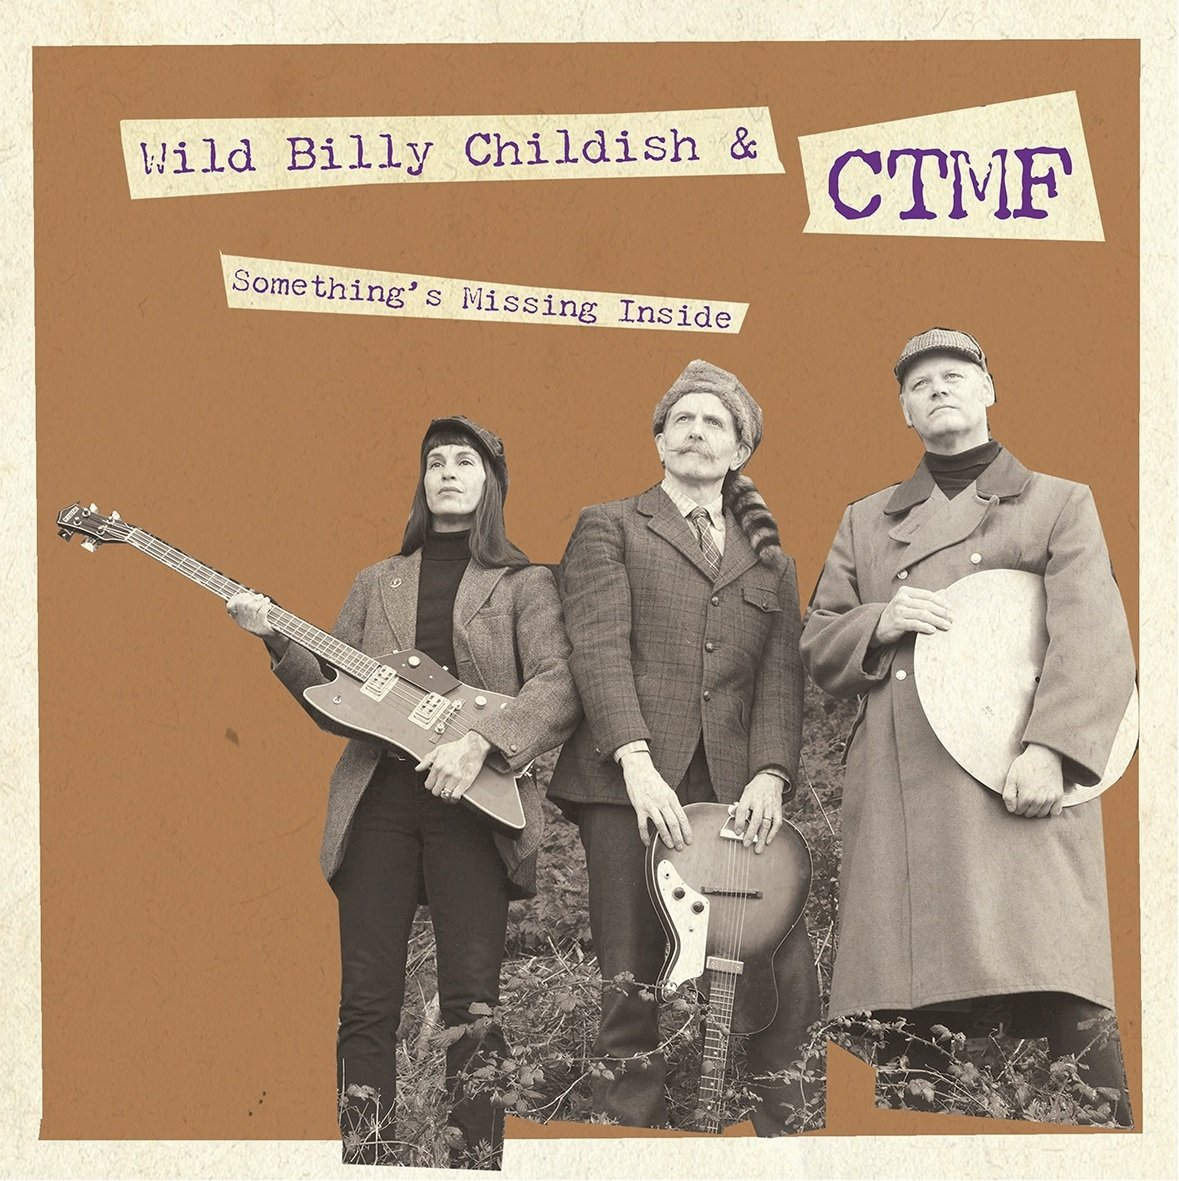 Cassette : CHILDISH, BILLY - Something's Missing Inside (7 Inch Single)